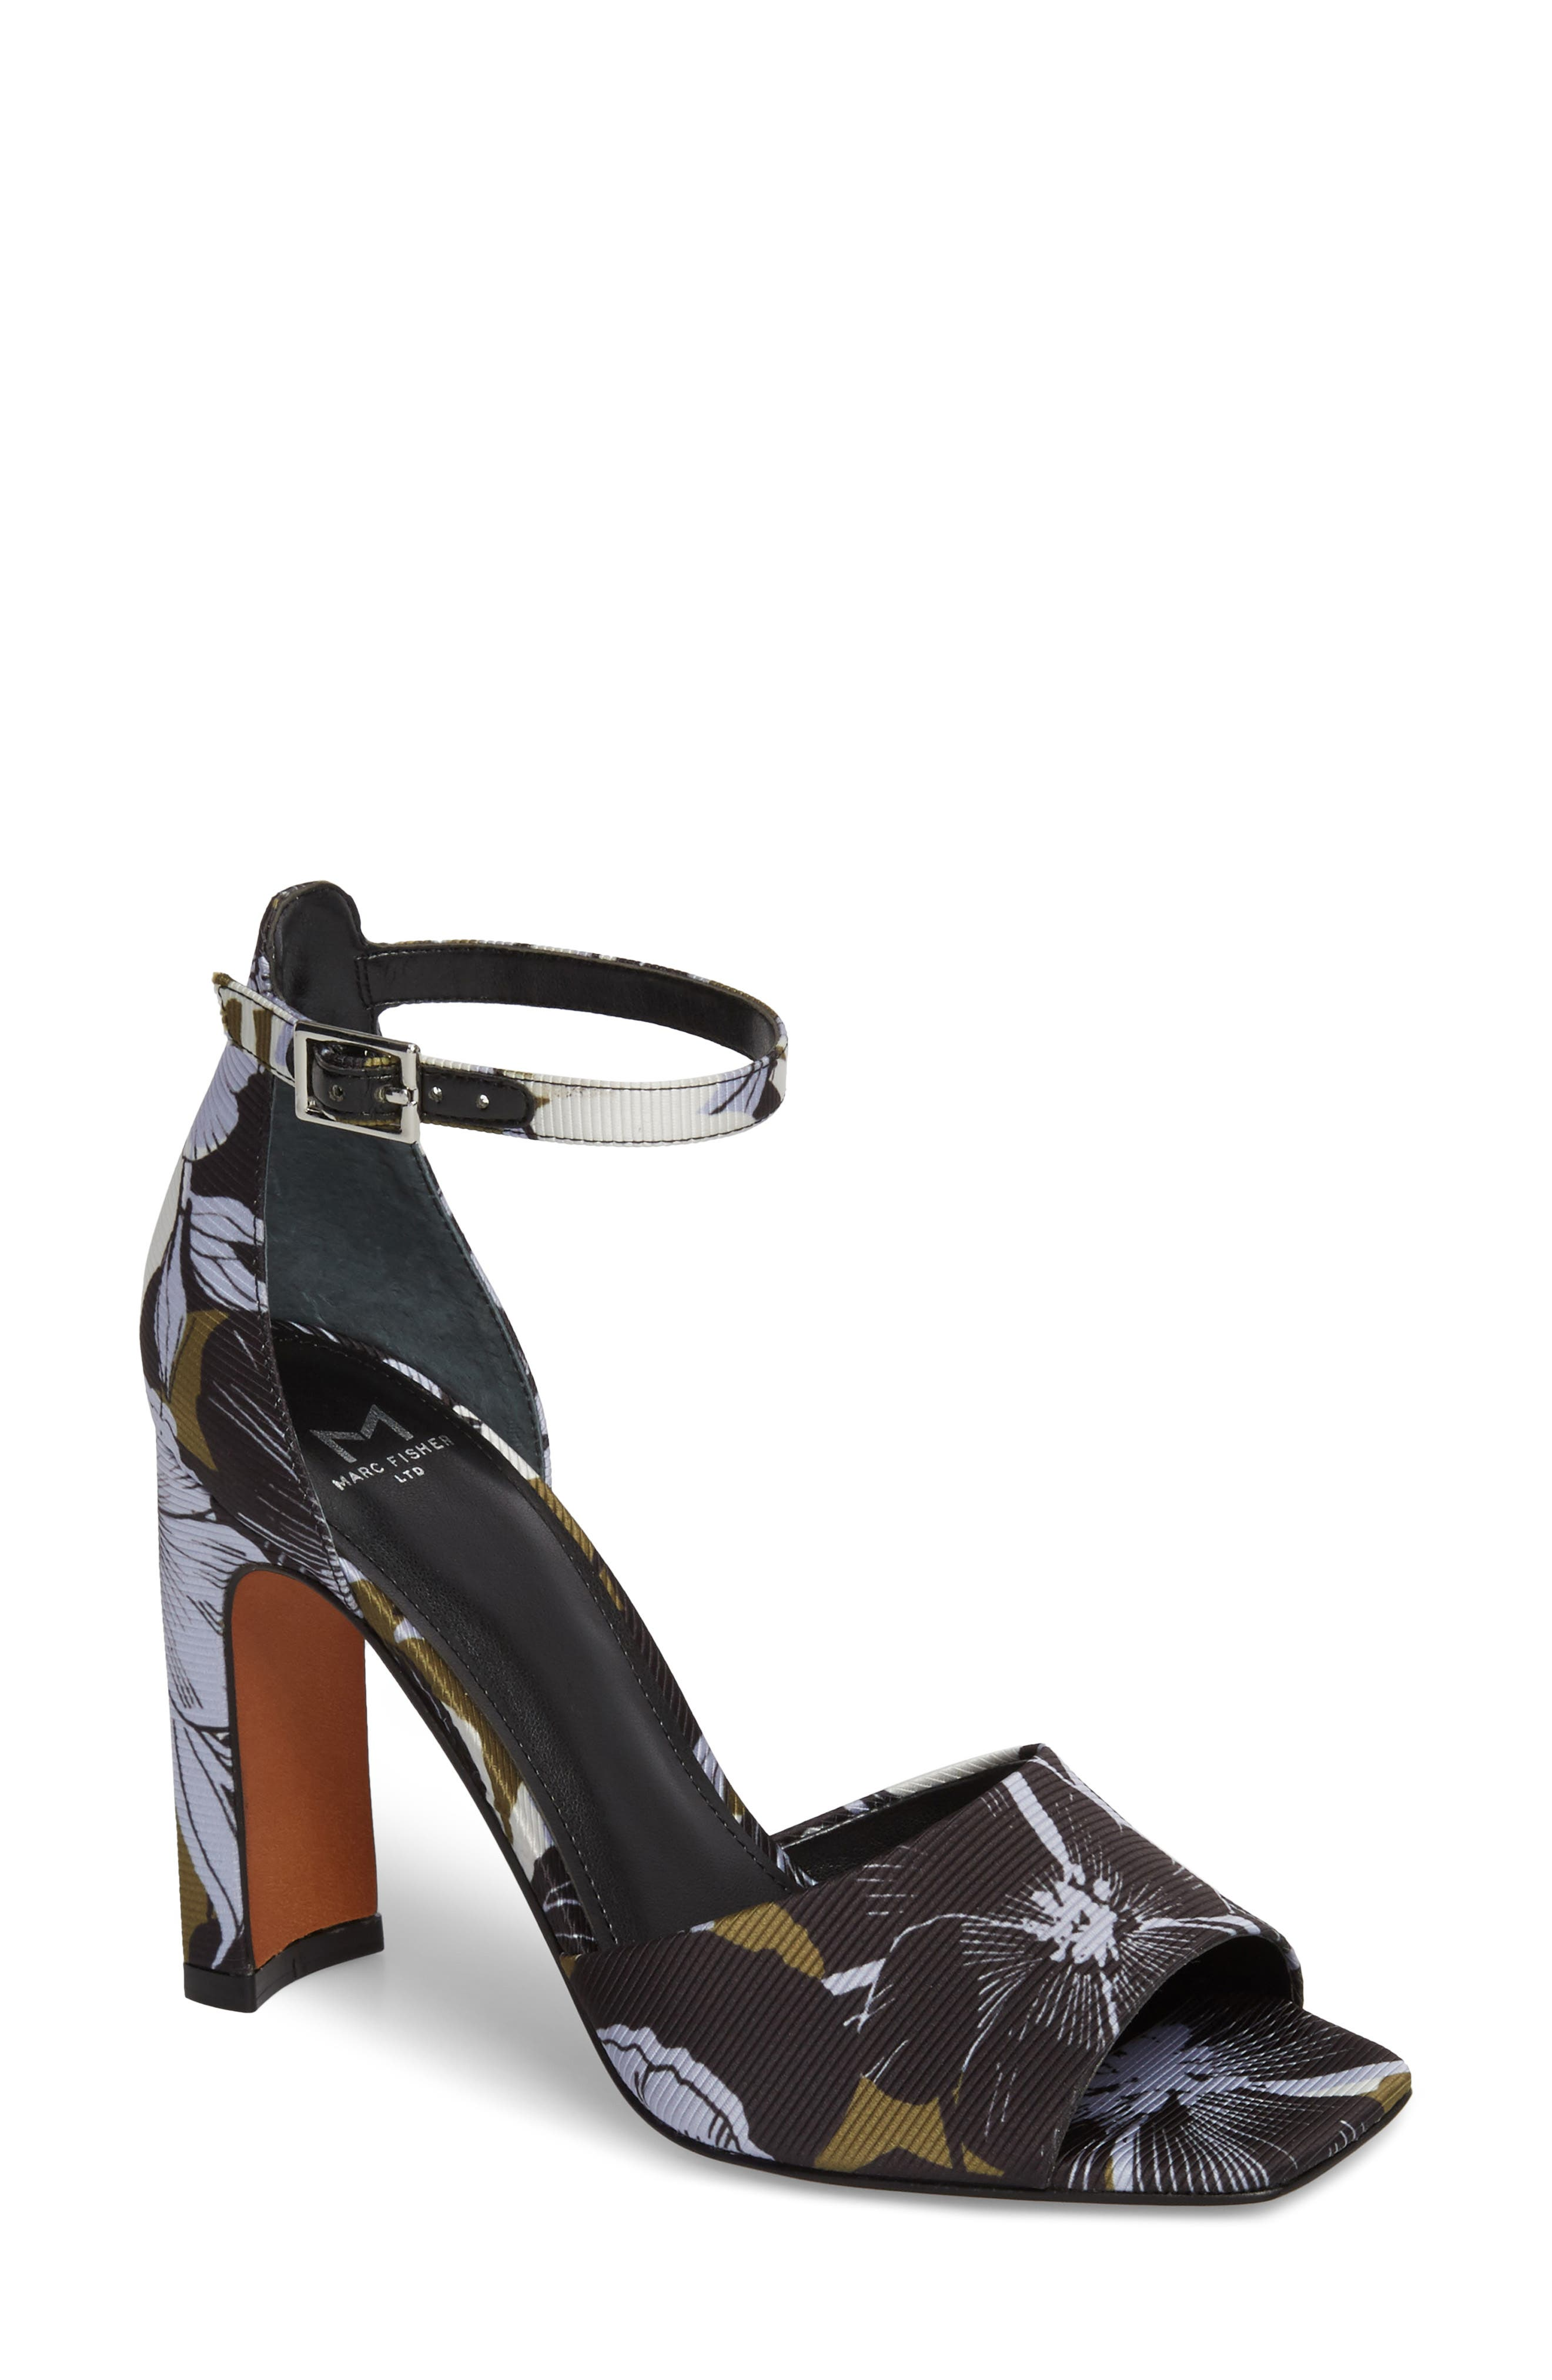 Harlin Ankle Strap Sandal,                             Main thumbnail 1, color,                             Jungle Print Fabric